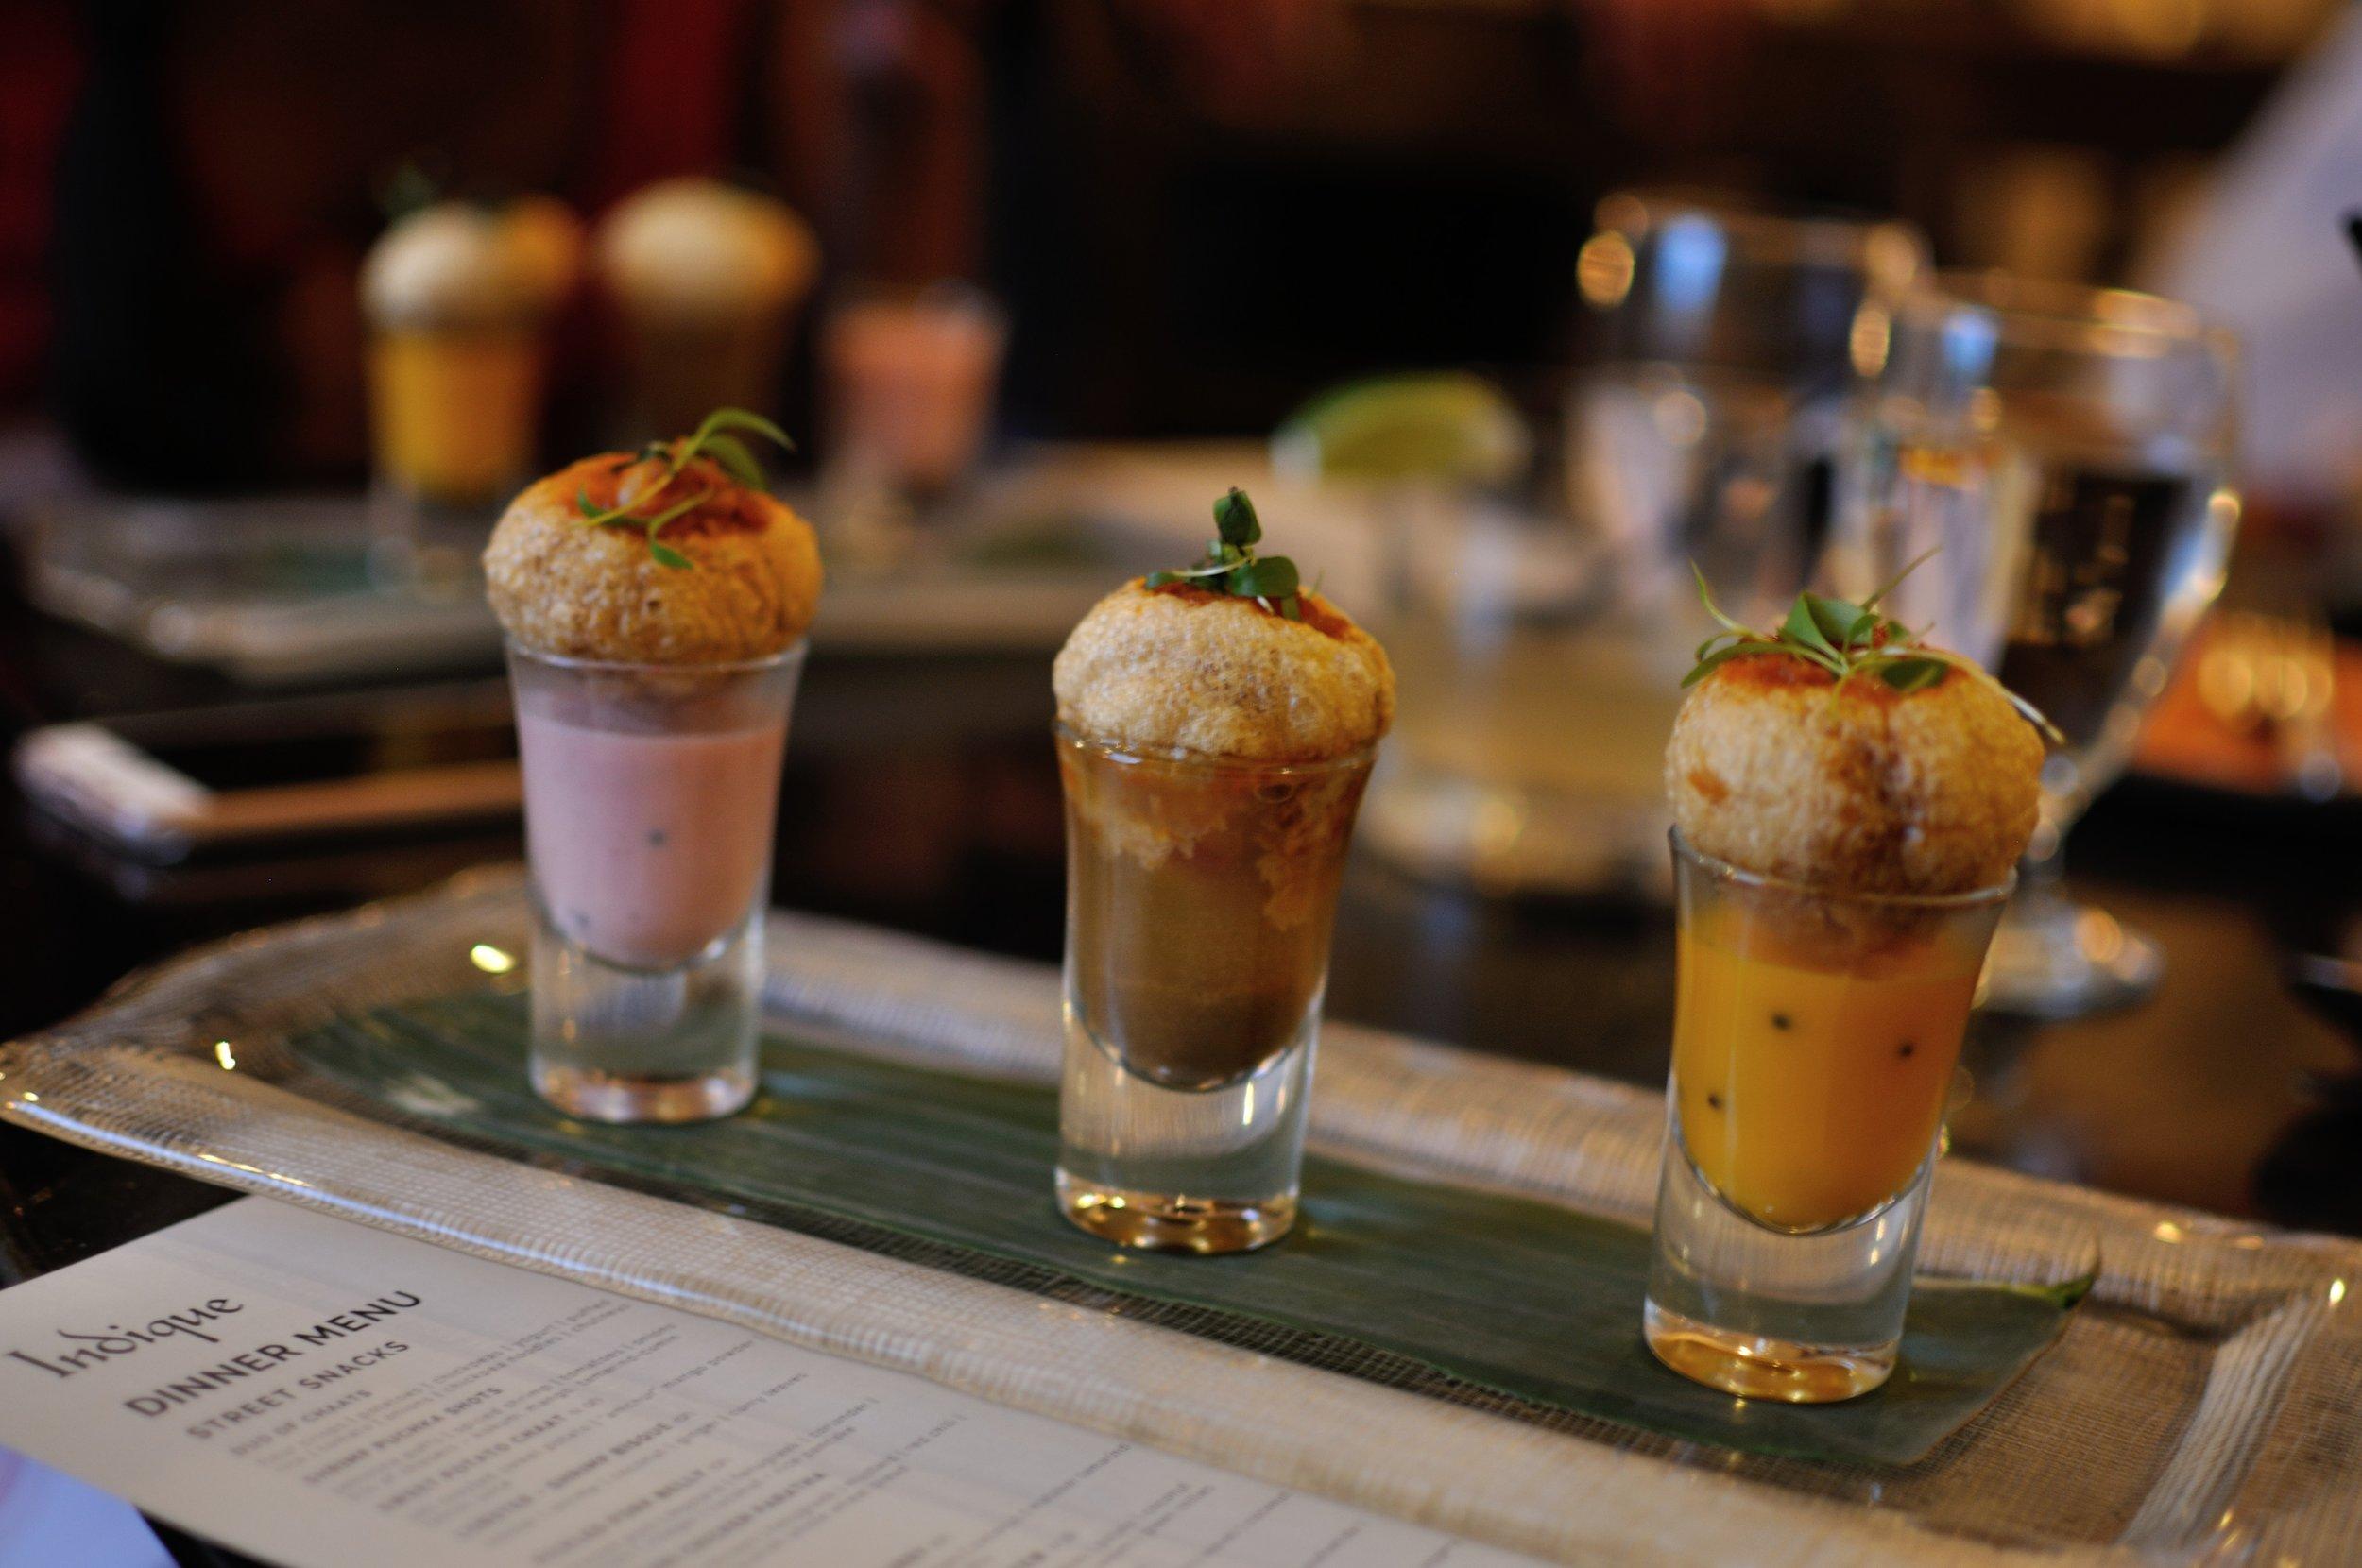 Shrimp puchka shots